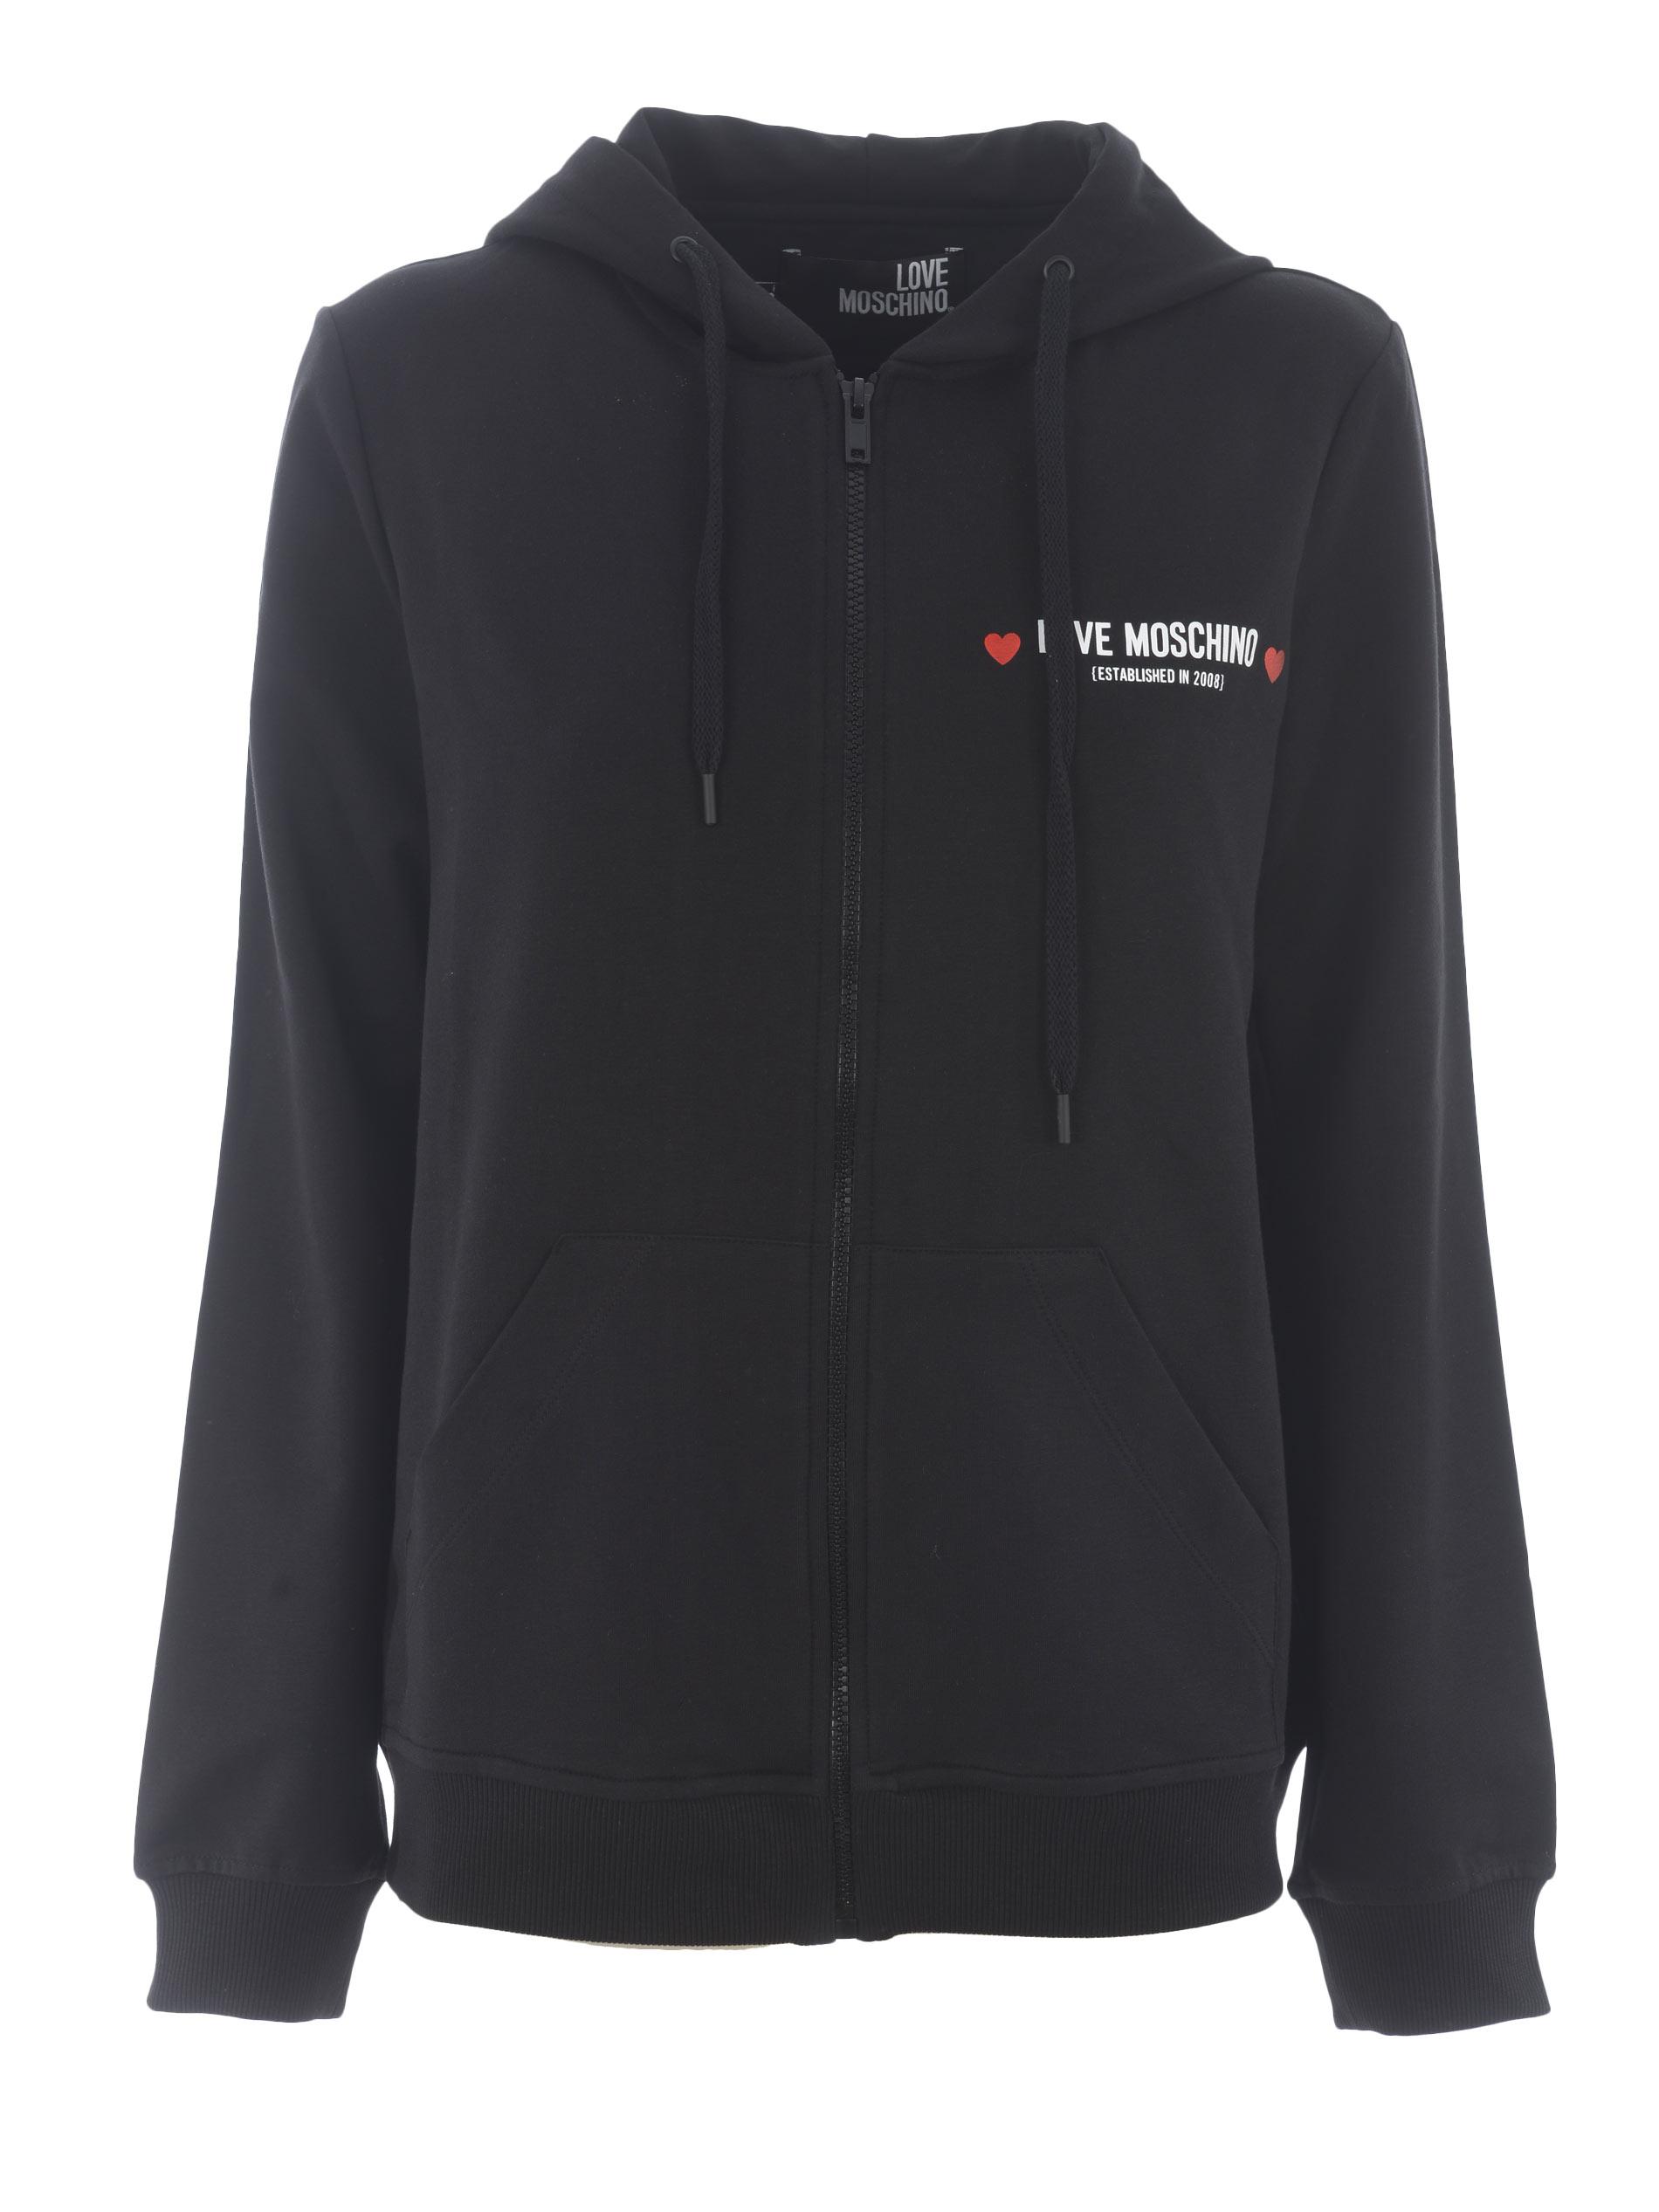 Love Moschino stretch cotton sweatshirt MOSCHINO LOVE | 10000005 | W333309E2180-C74